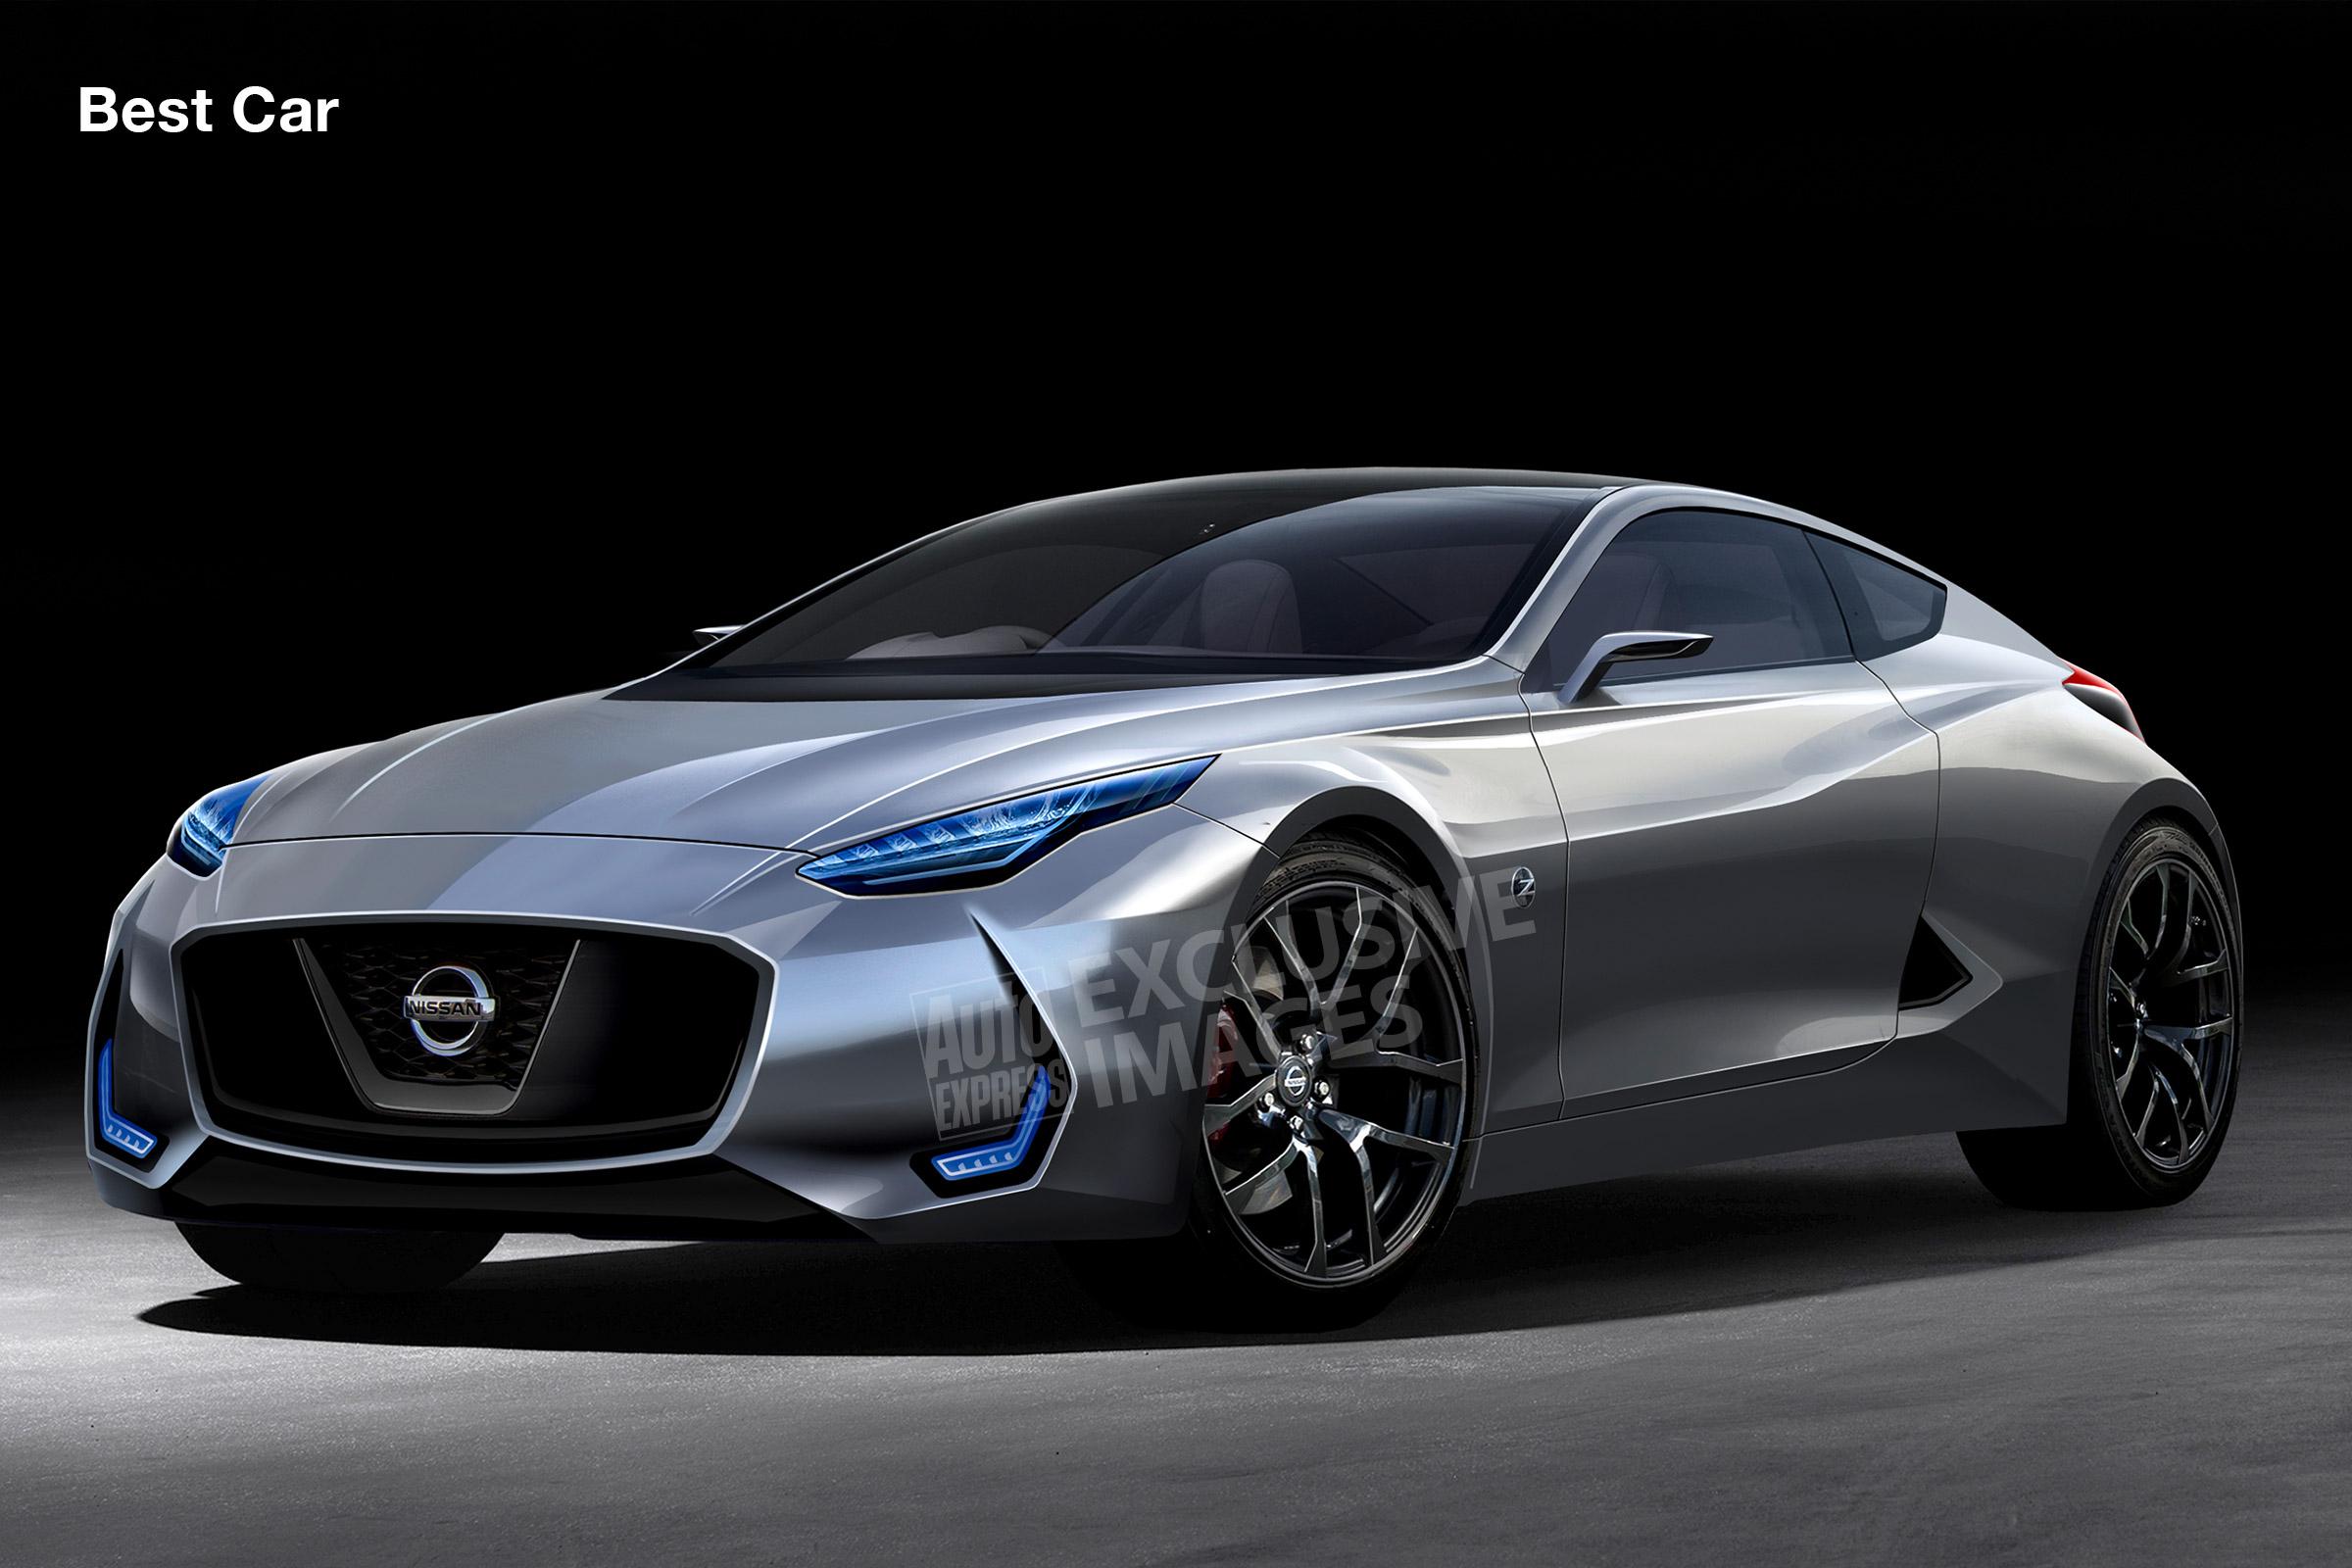 New Nissan Z-car concept